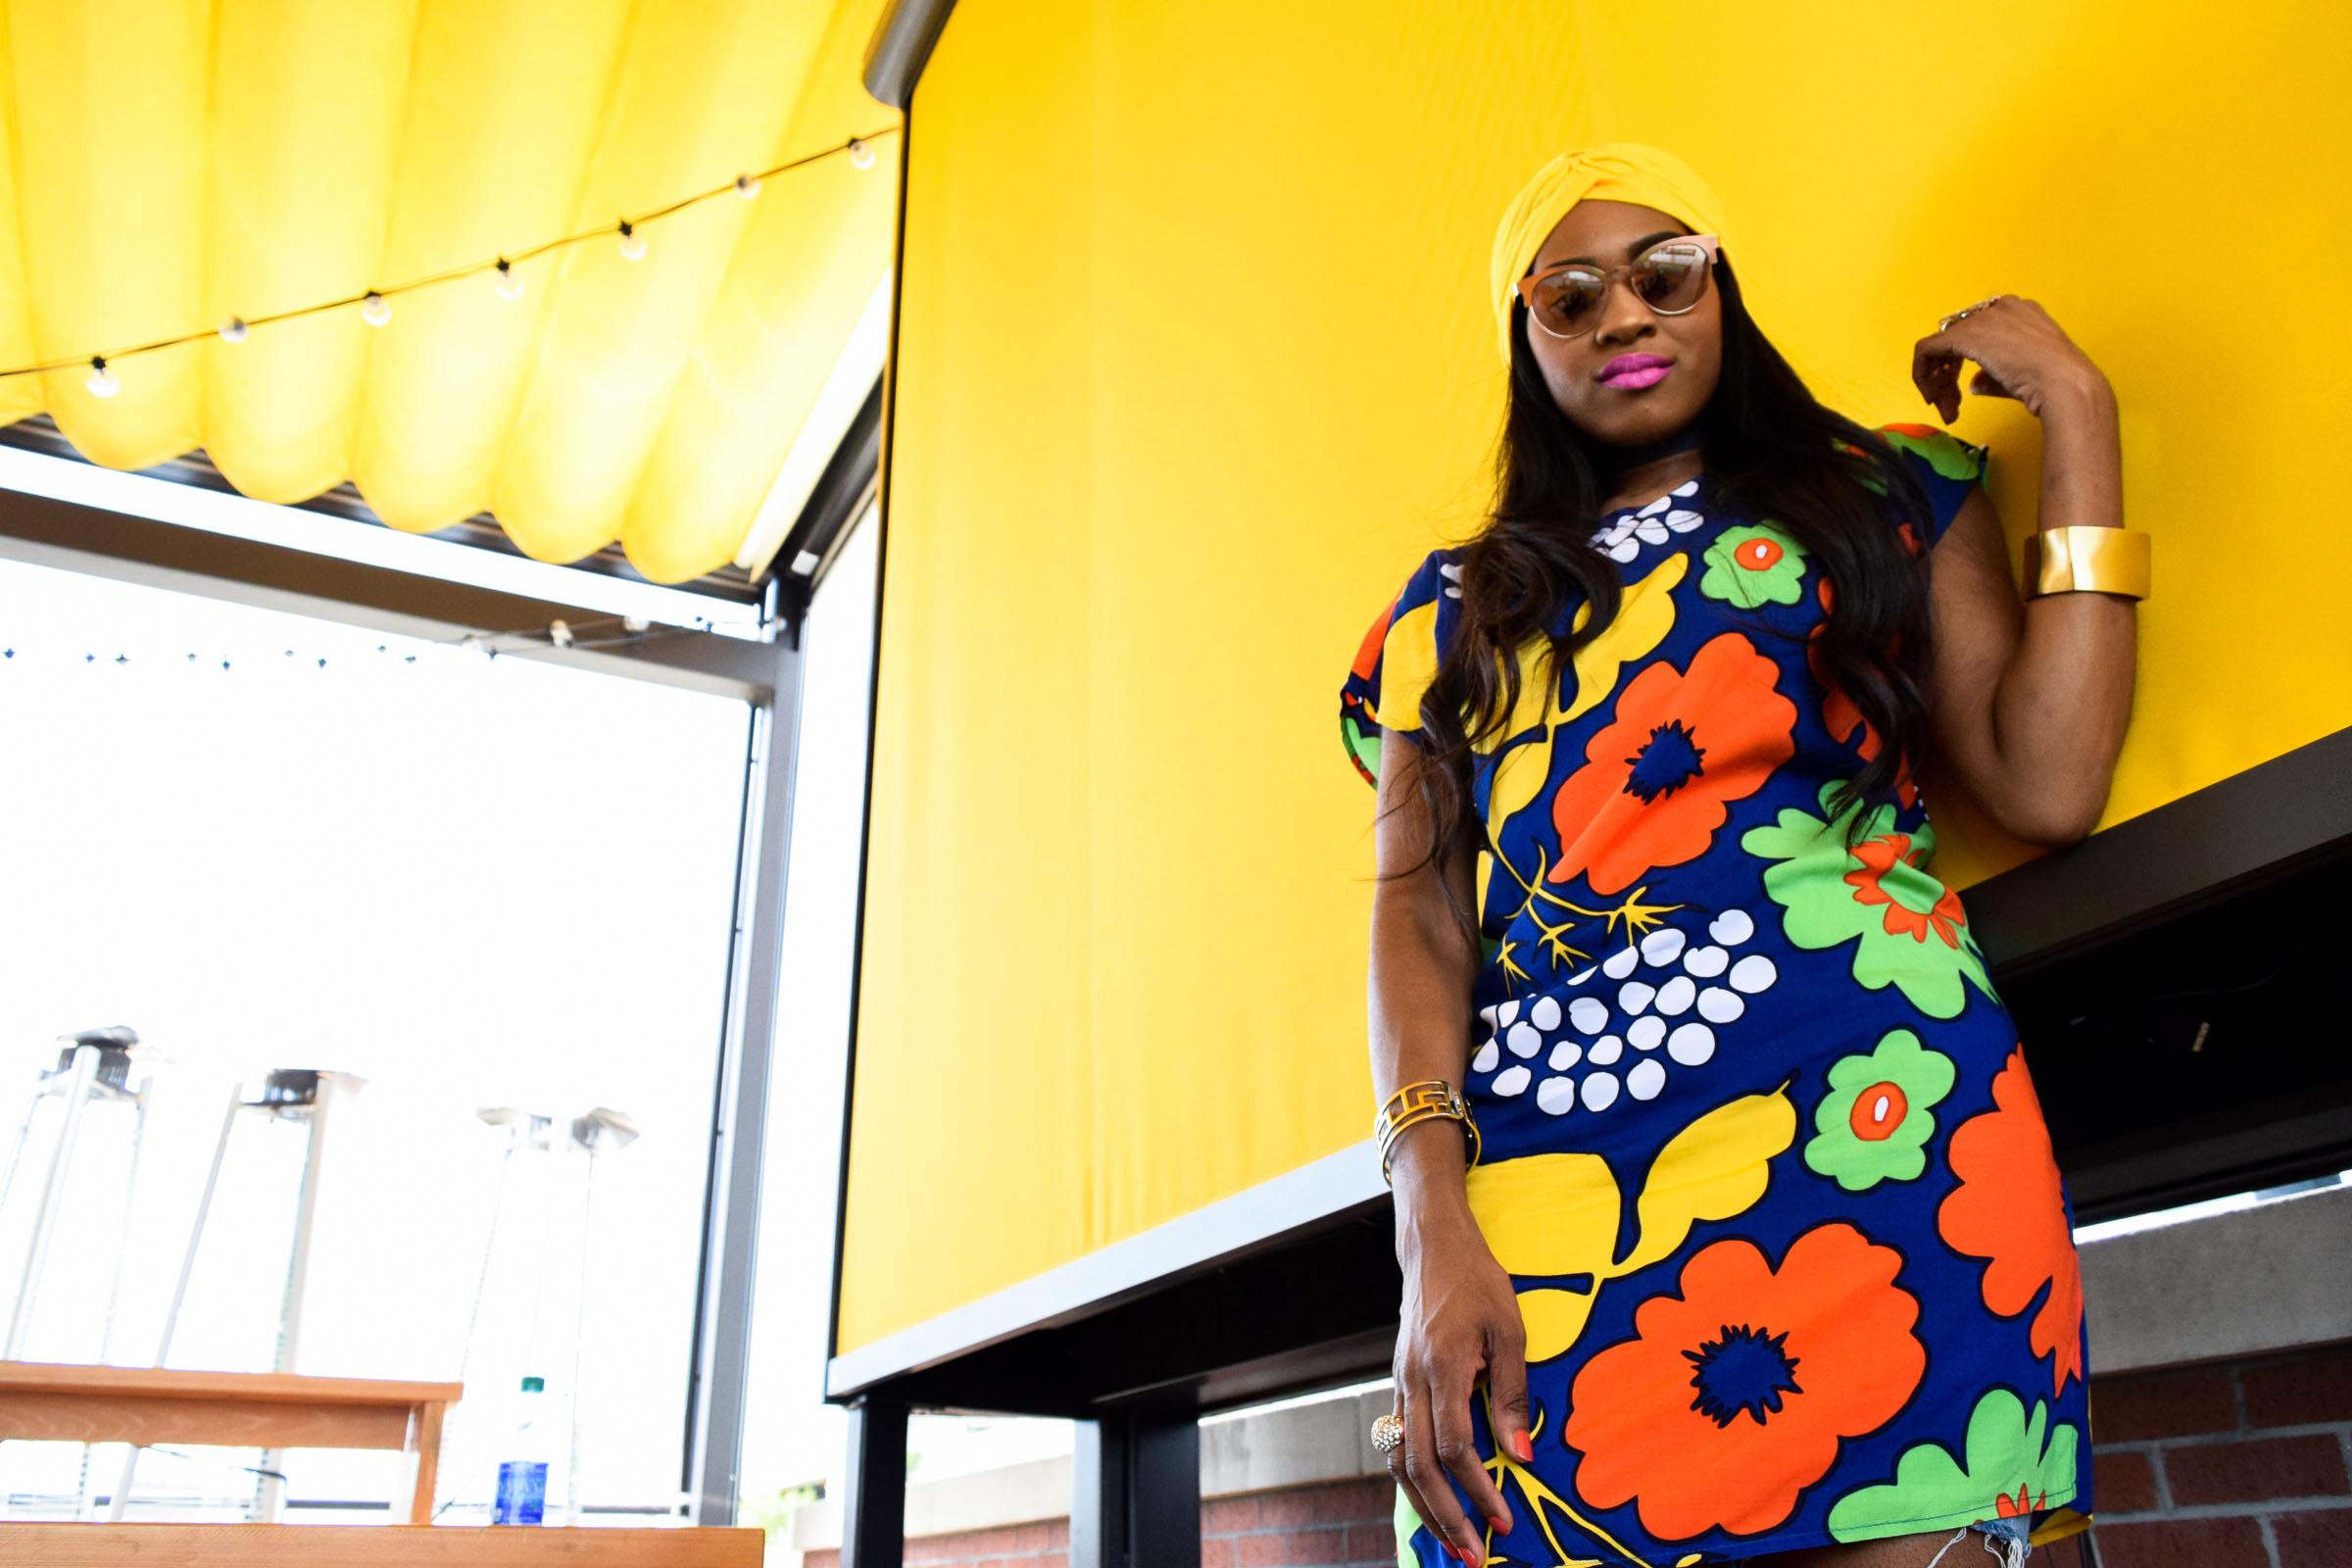 Style-Files-Target-Marimeko-collection -floral-tunic-justfab-tayrey-yellow-fringe-heels-sandals-yellow-turban-asos-denim-choker-oohlalablog-3